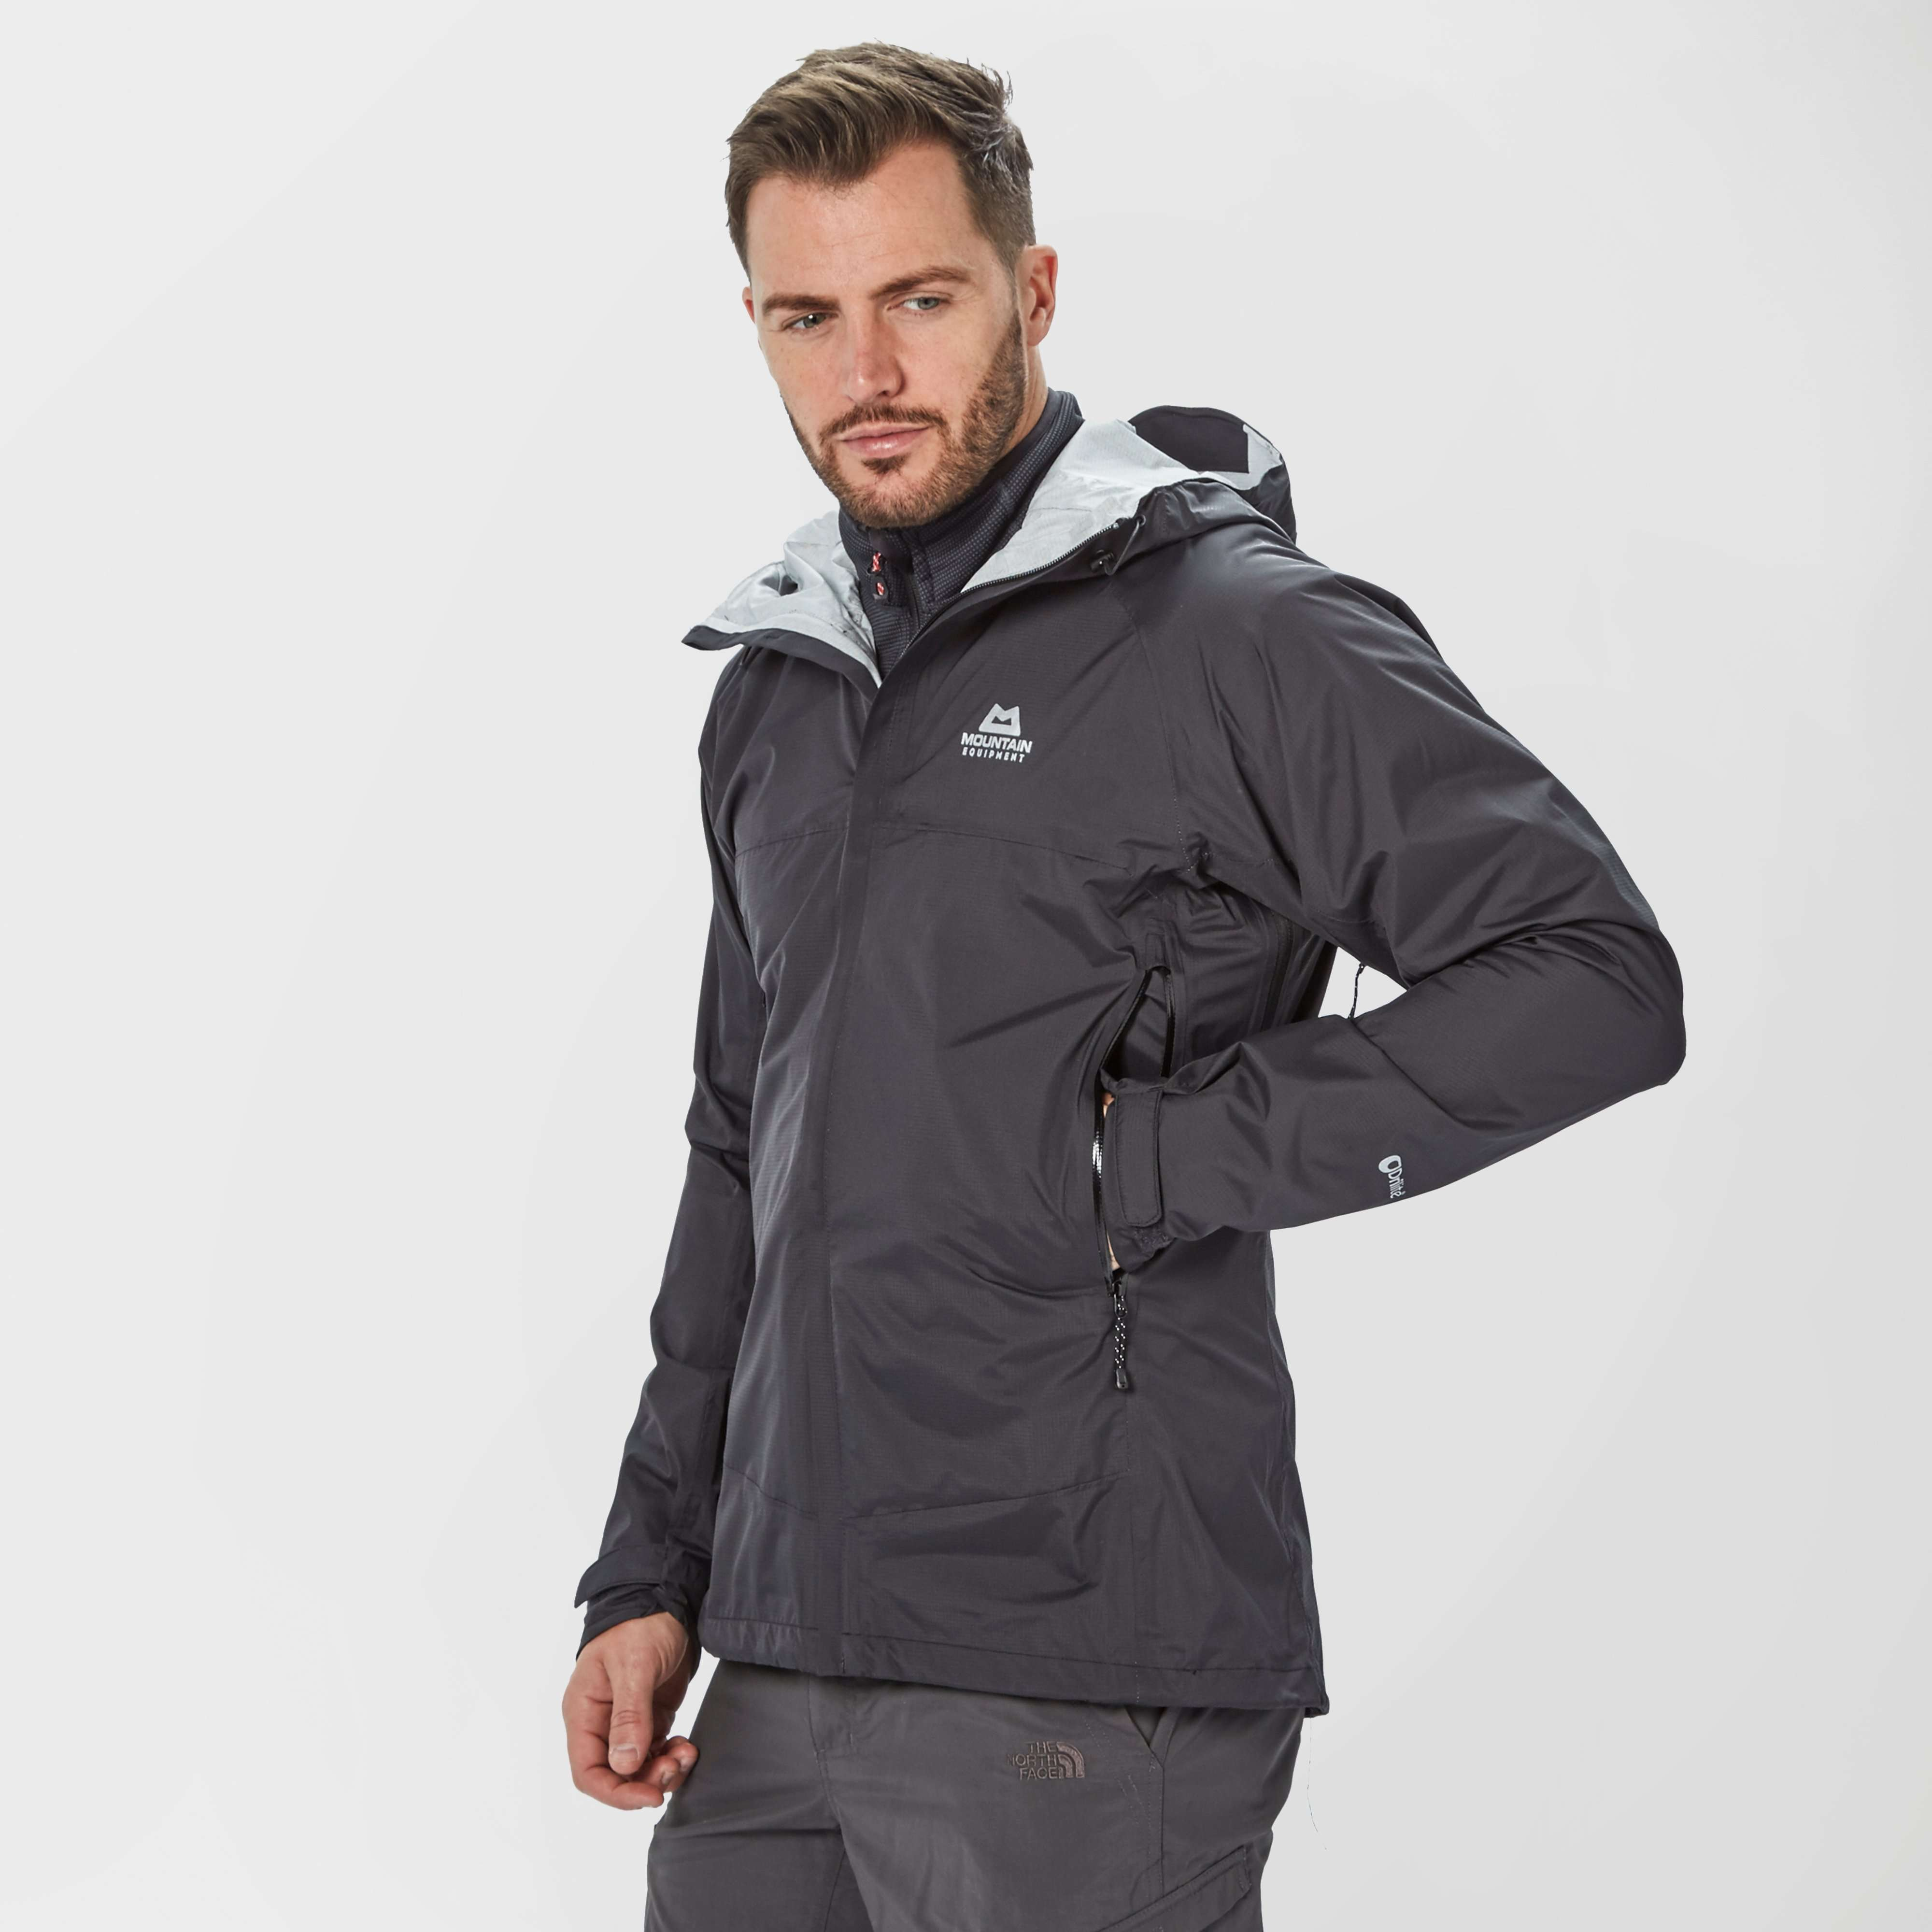 MOUNTAIN EQUIPMENT Men's Zeno Jacket